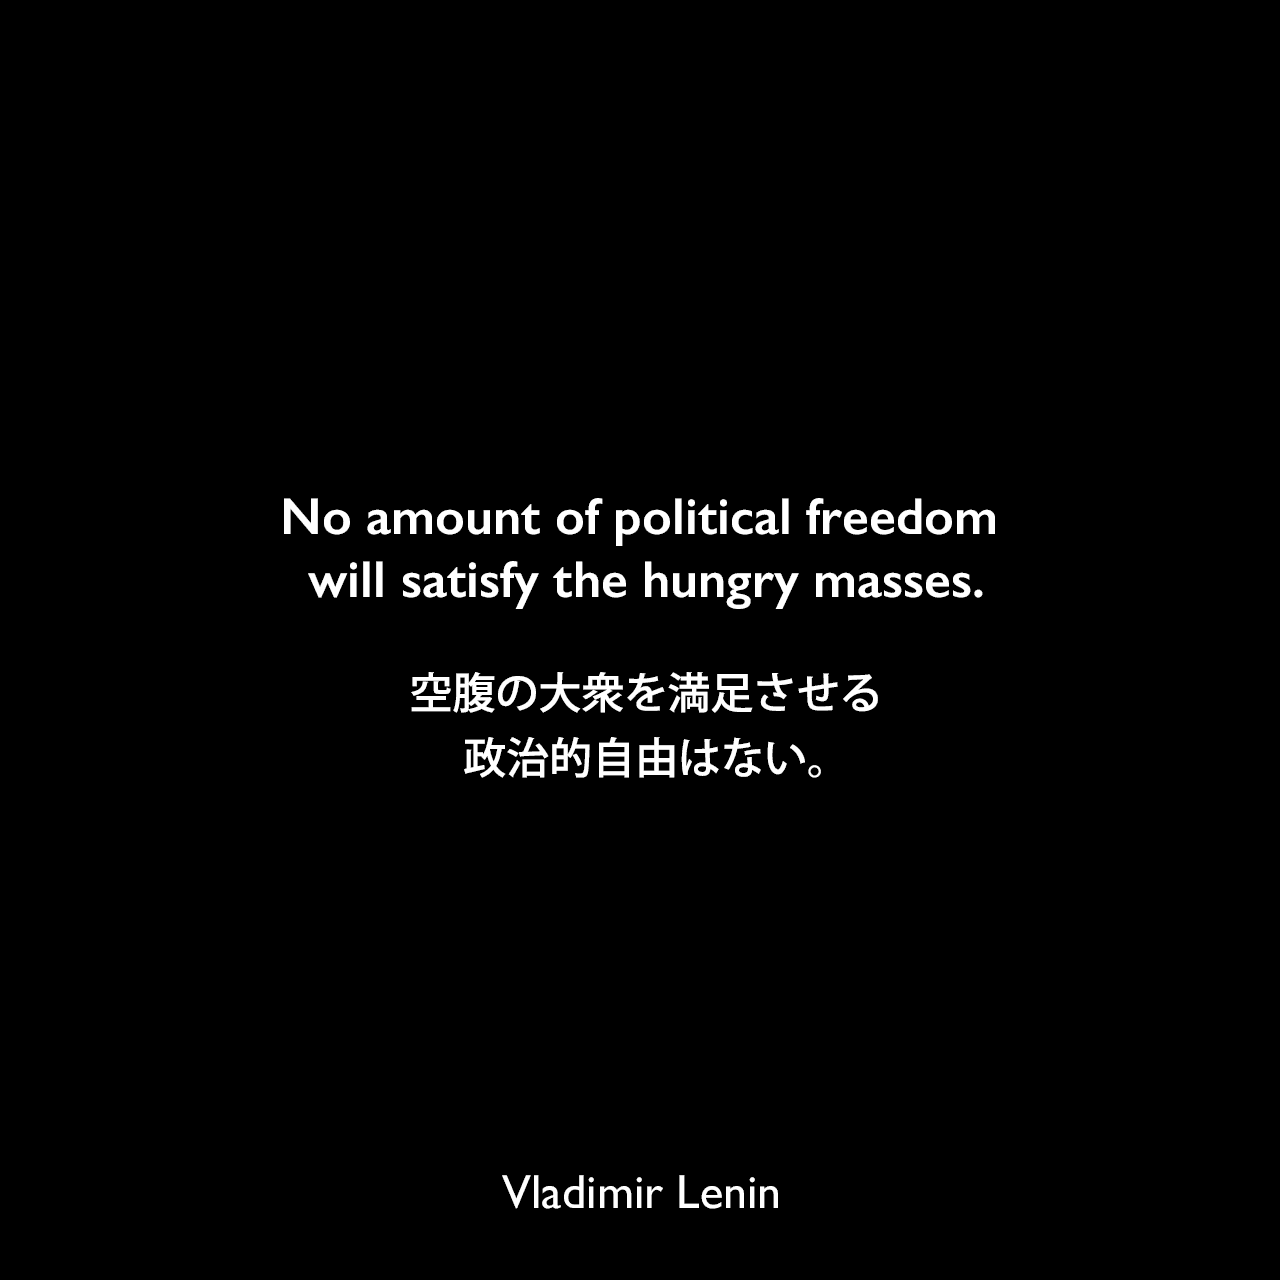 No amount of political freedom will satisfy the hungry masses.空腹の大衆を満足させる政治的自由はない。Vladimir Lenin